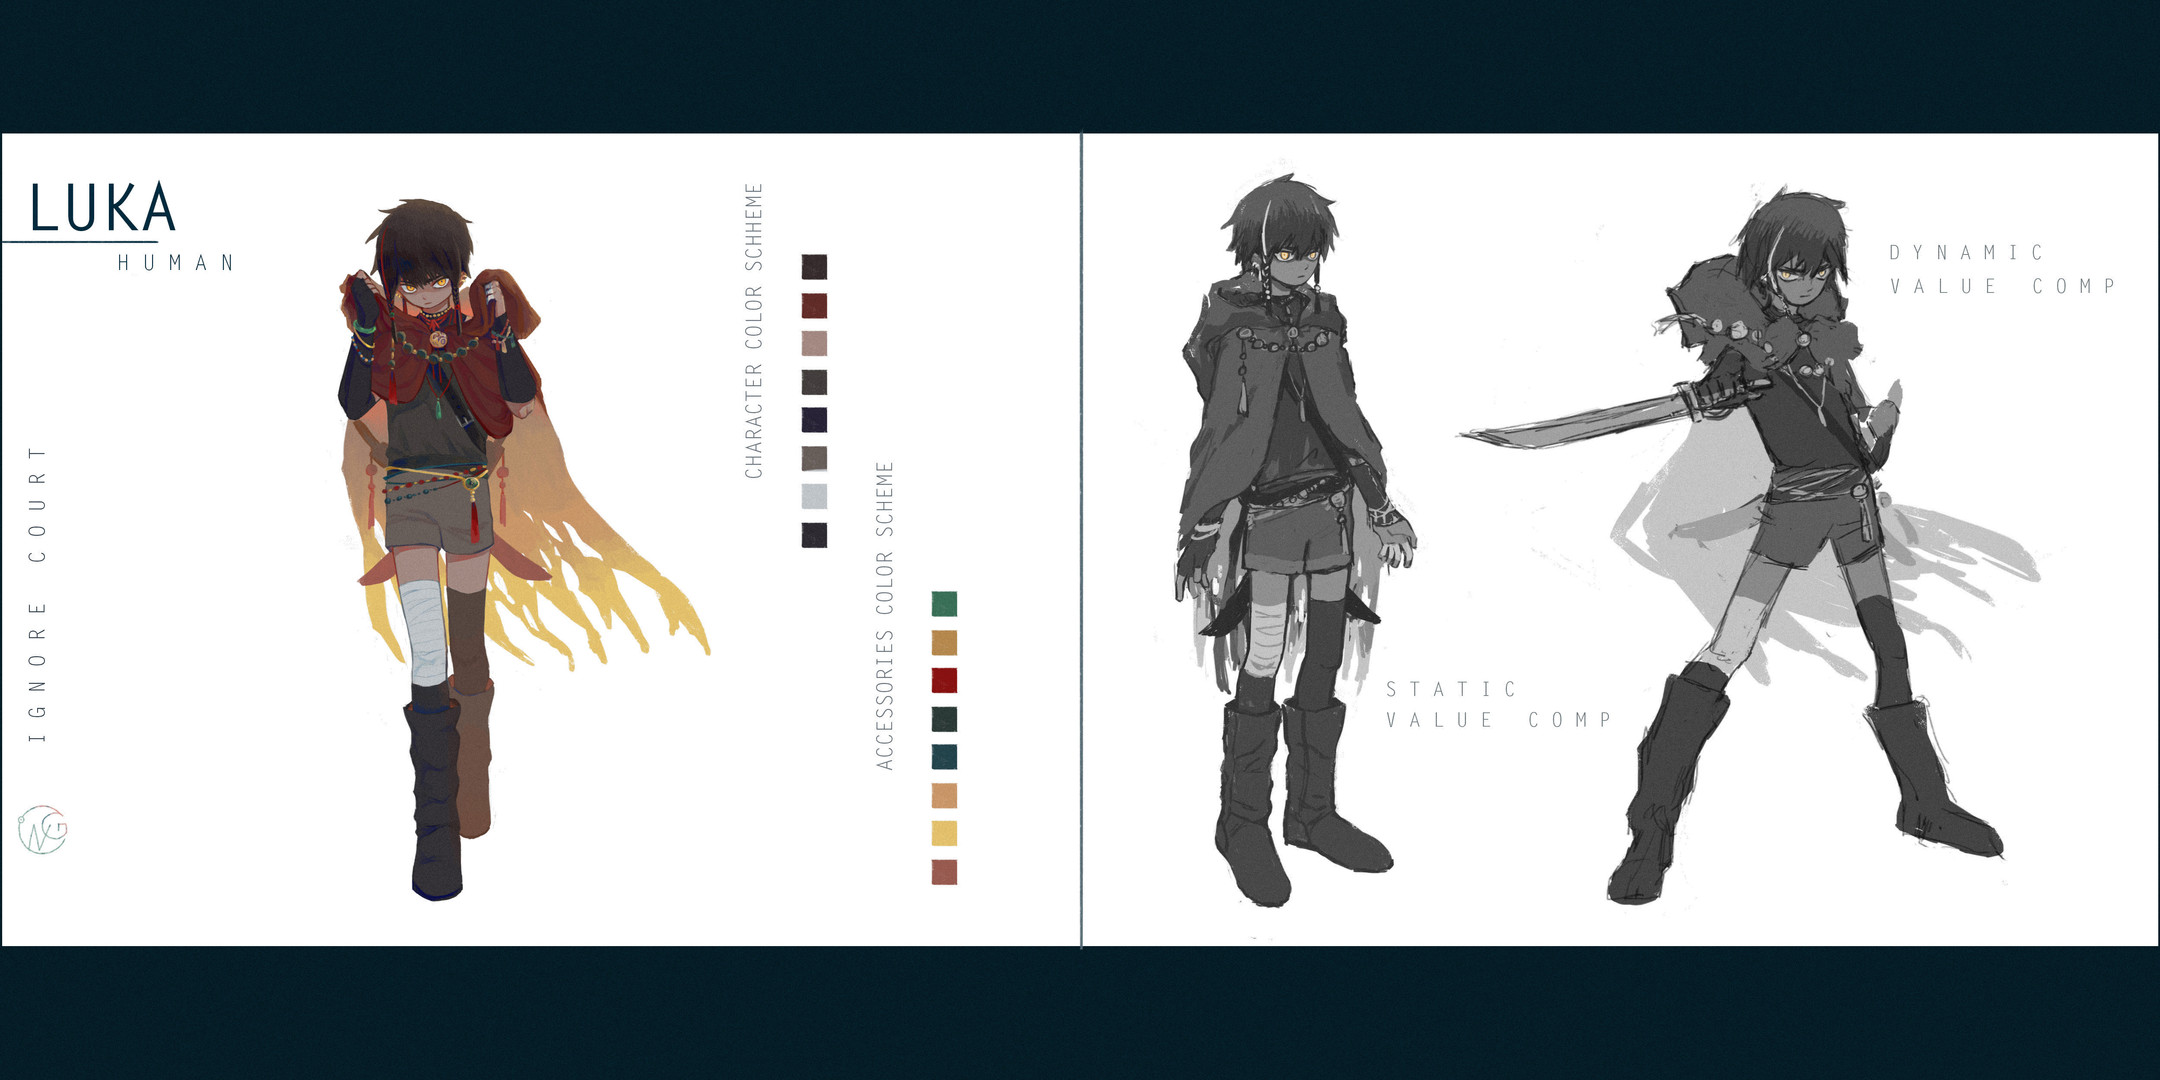 character settings-luka.jpg